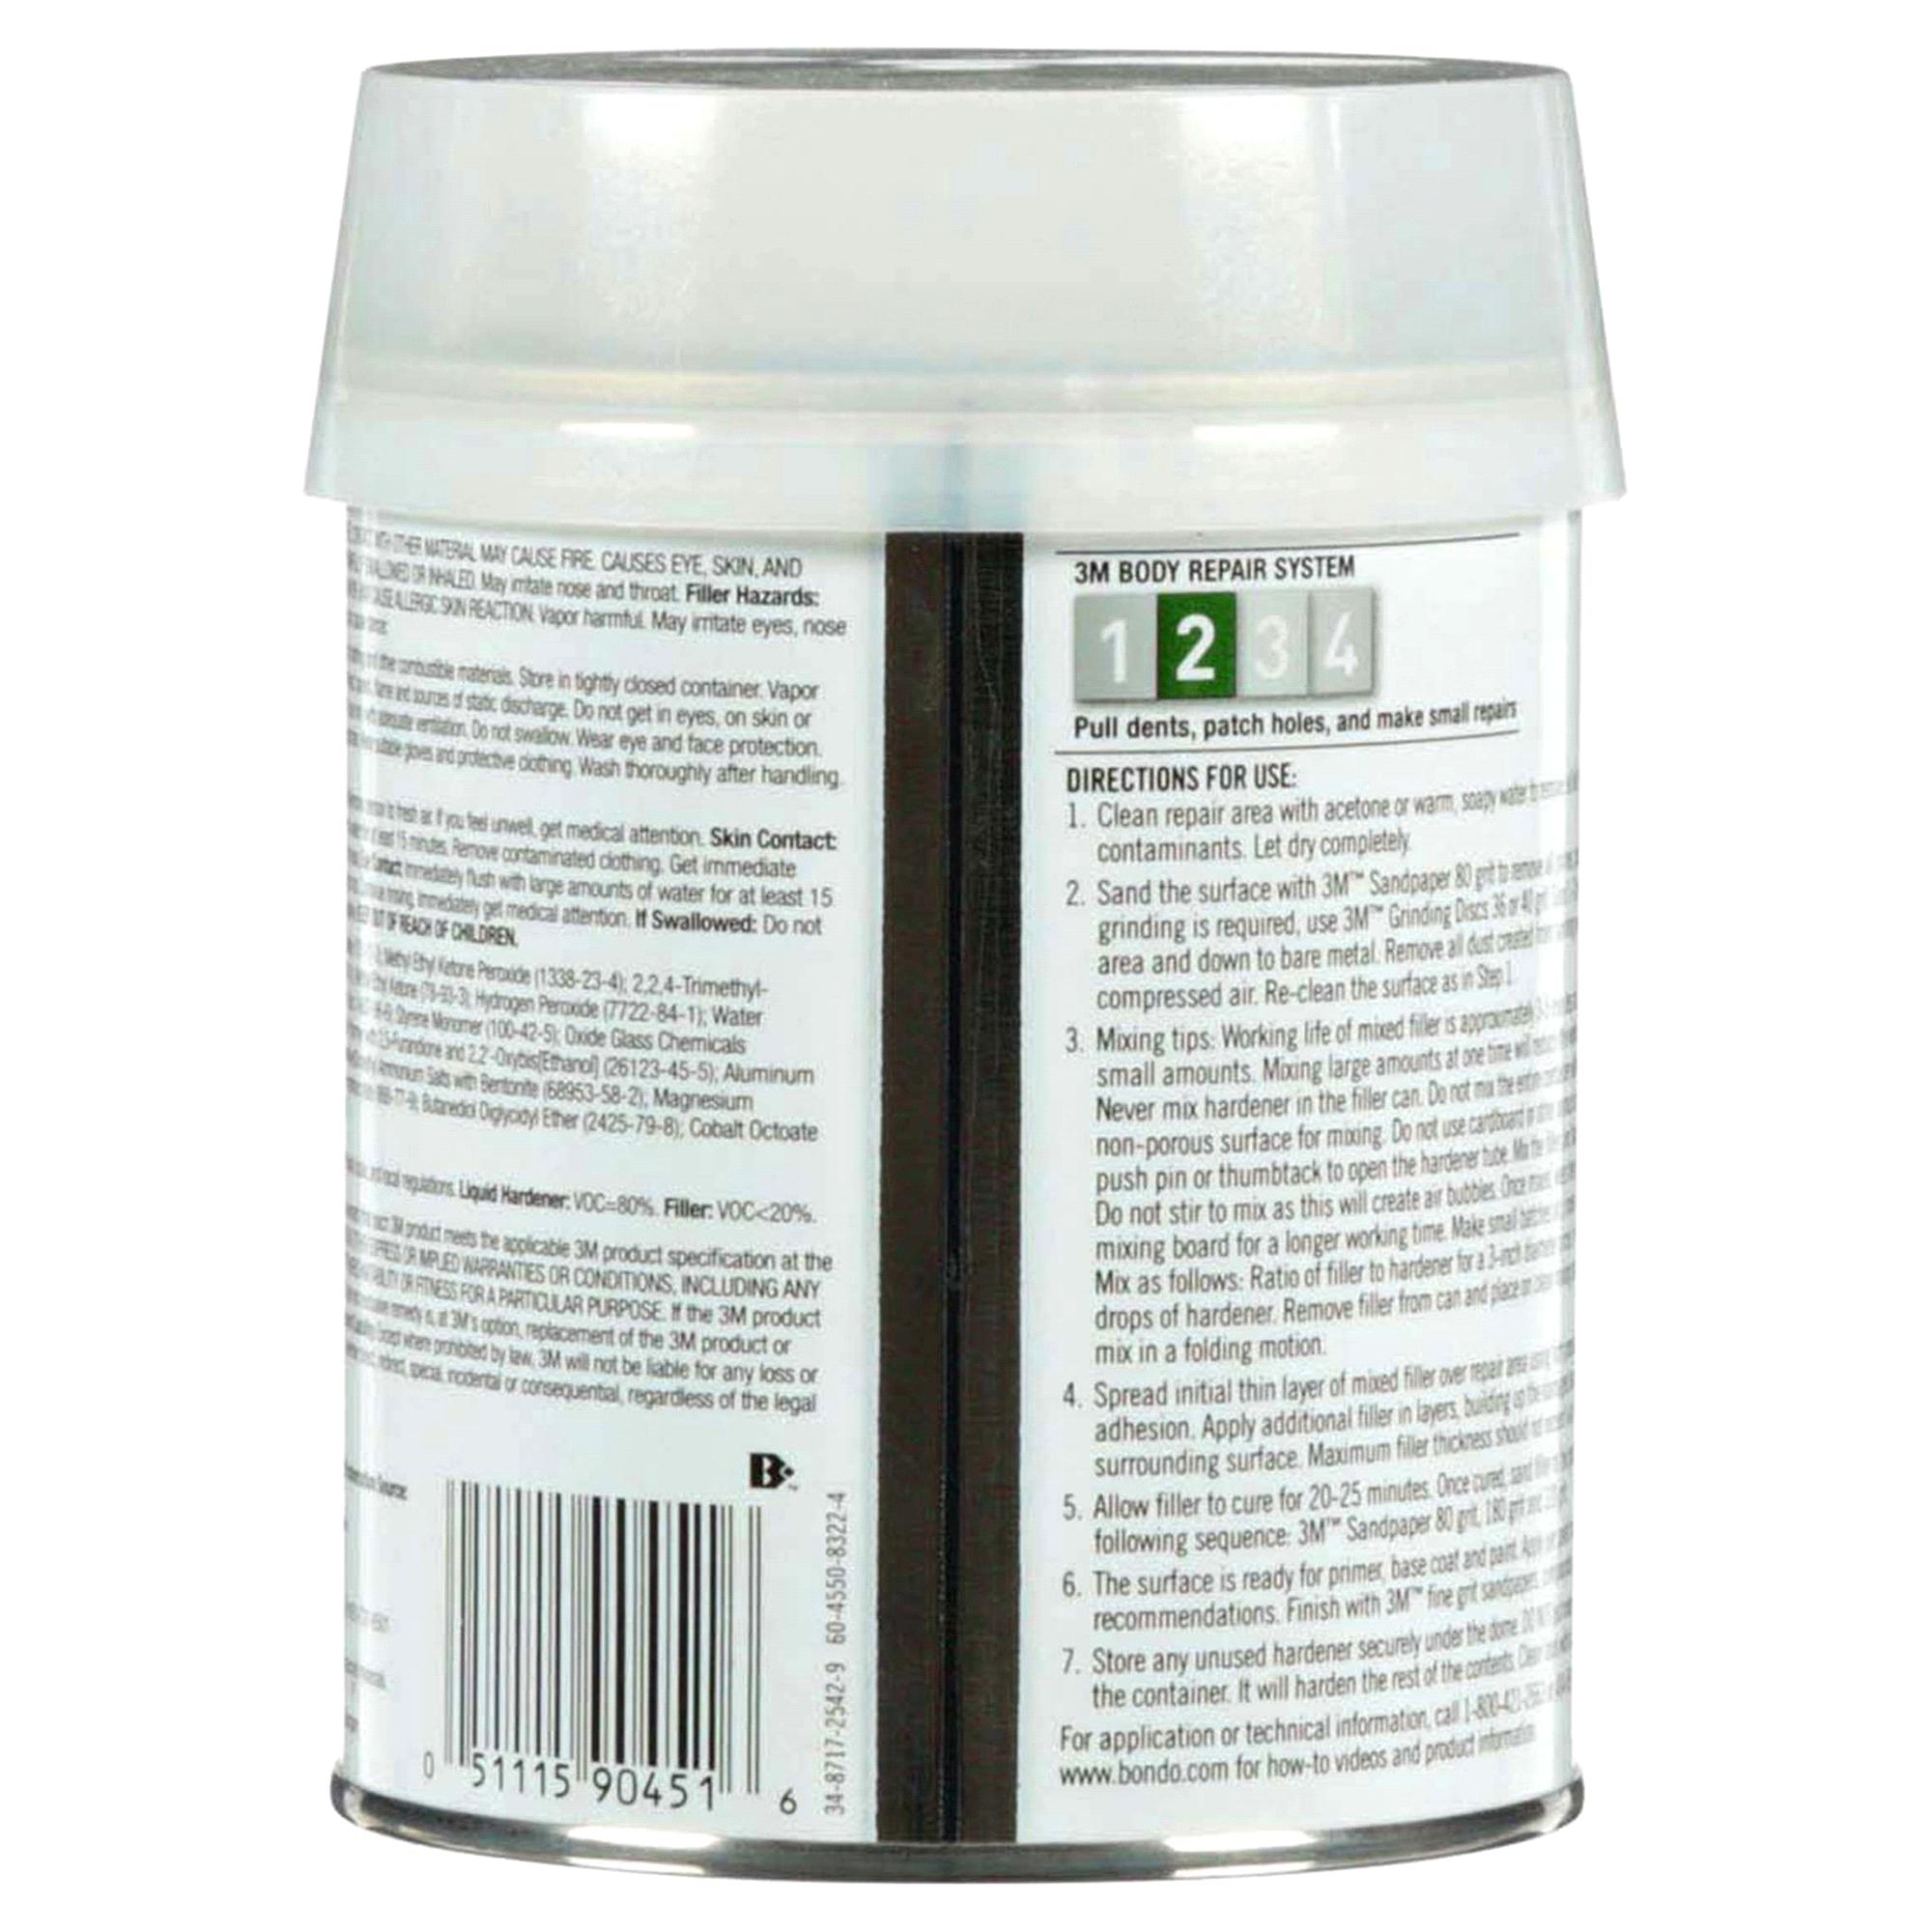 Bondo® Metal Reinforced Filler 0.7 Pint   Meijer.com